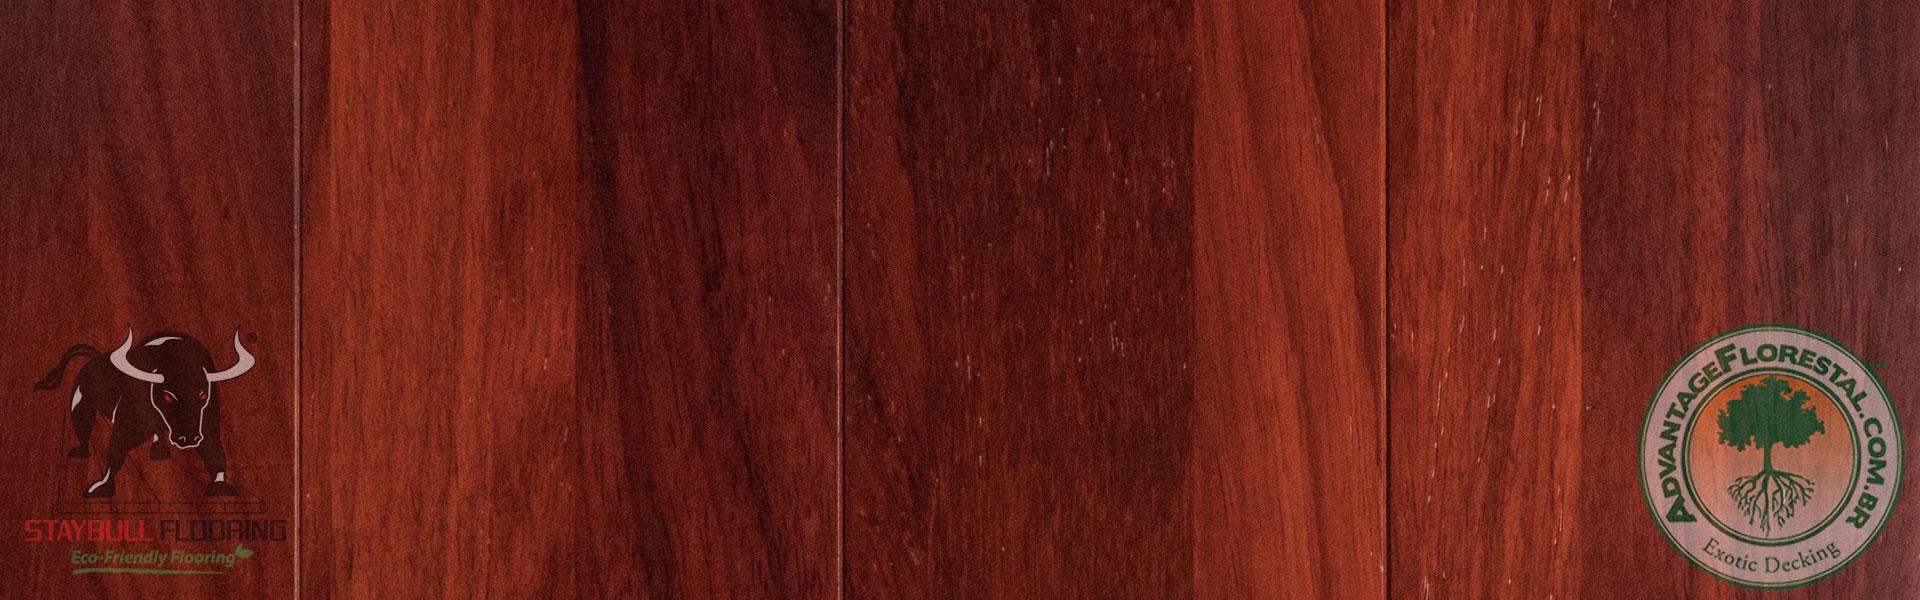 Staybull African Padauk eco-friendly exotic hardwood flooring